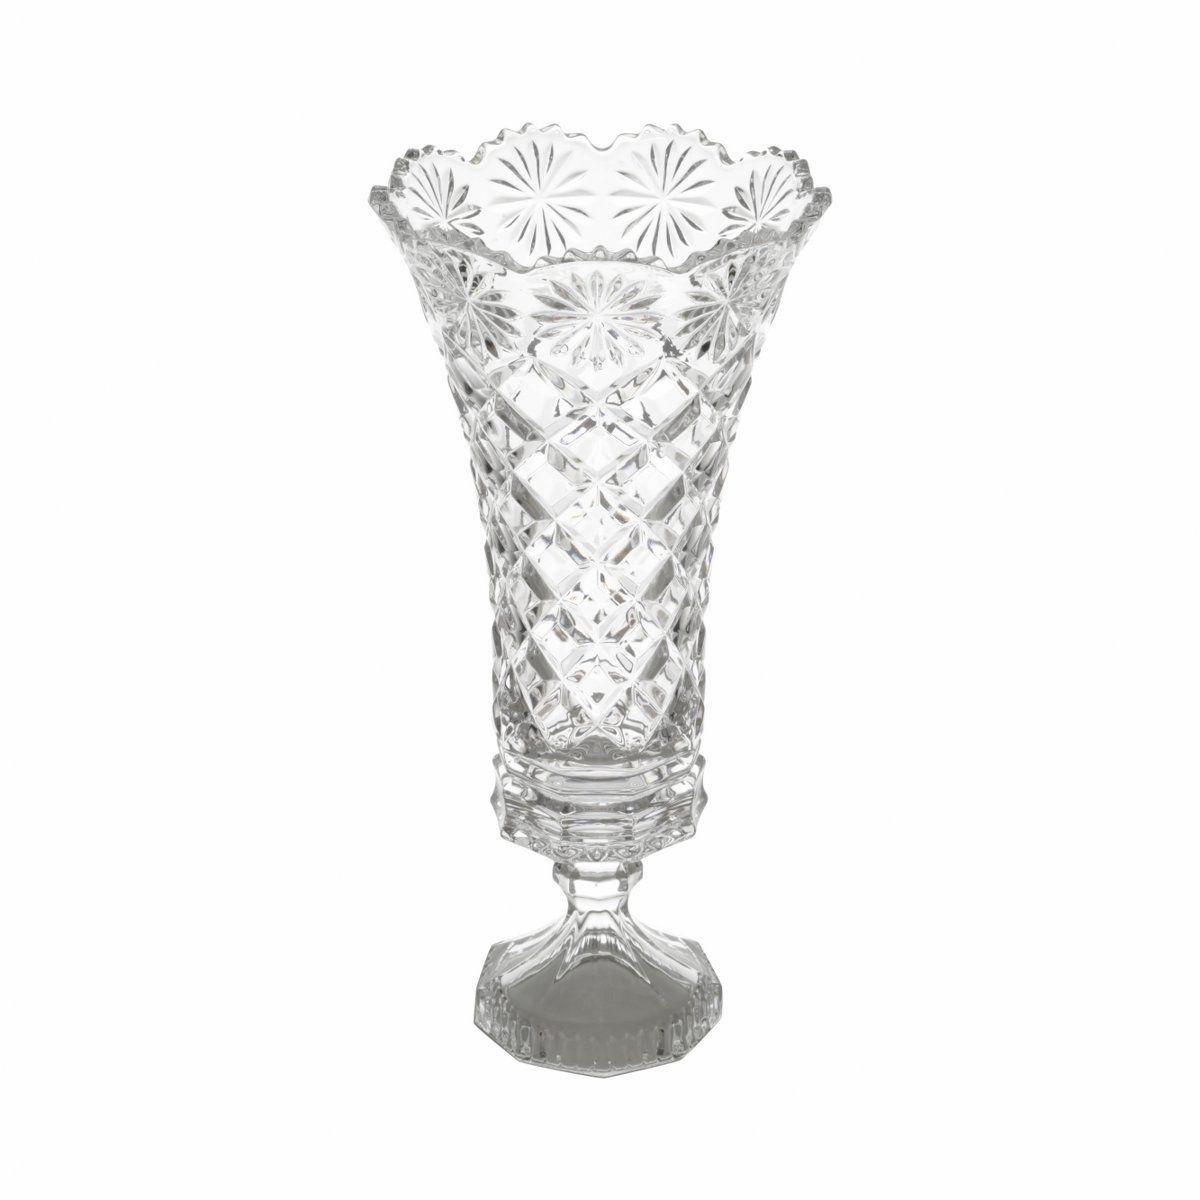 VASO COM PÉ DE CRISTAL DIAMOND - LYOR 3823